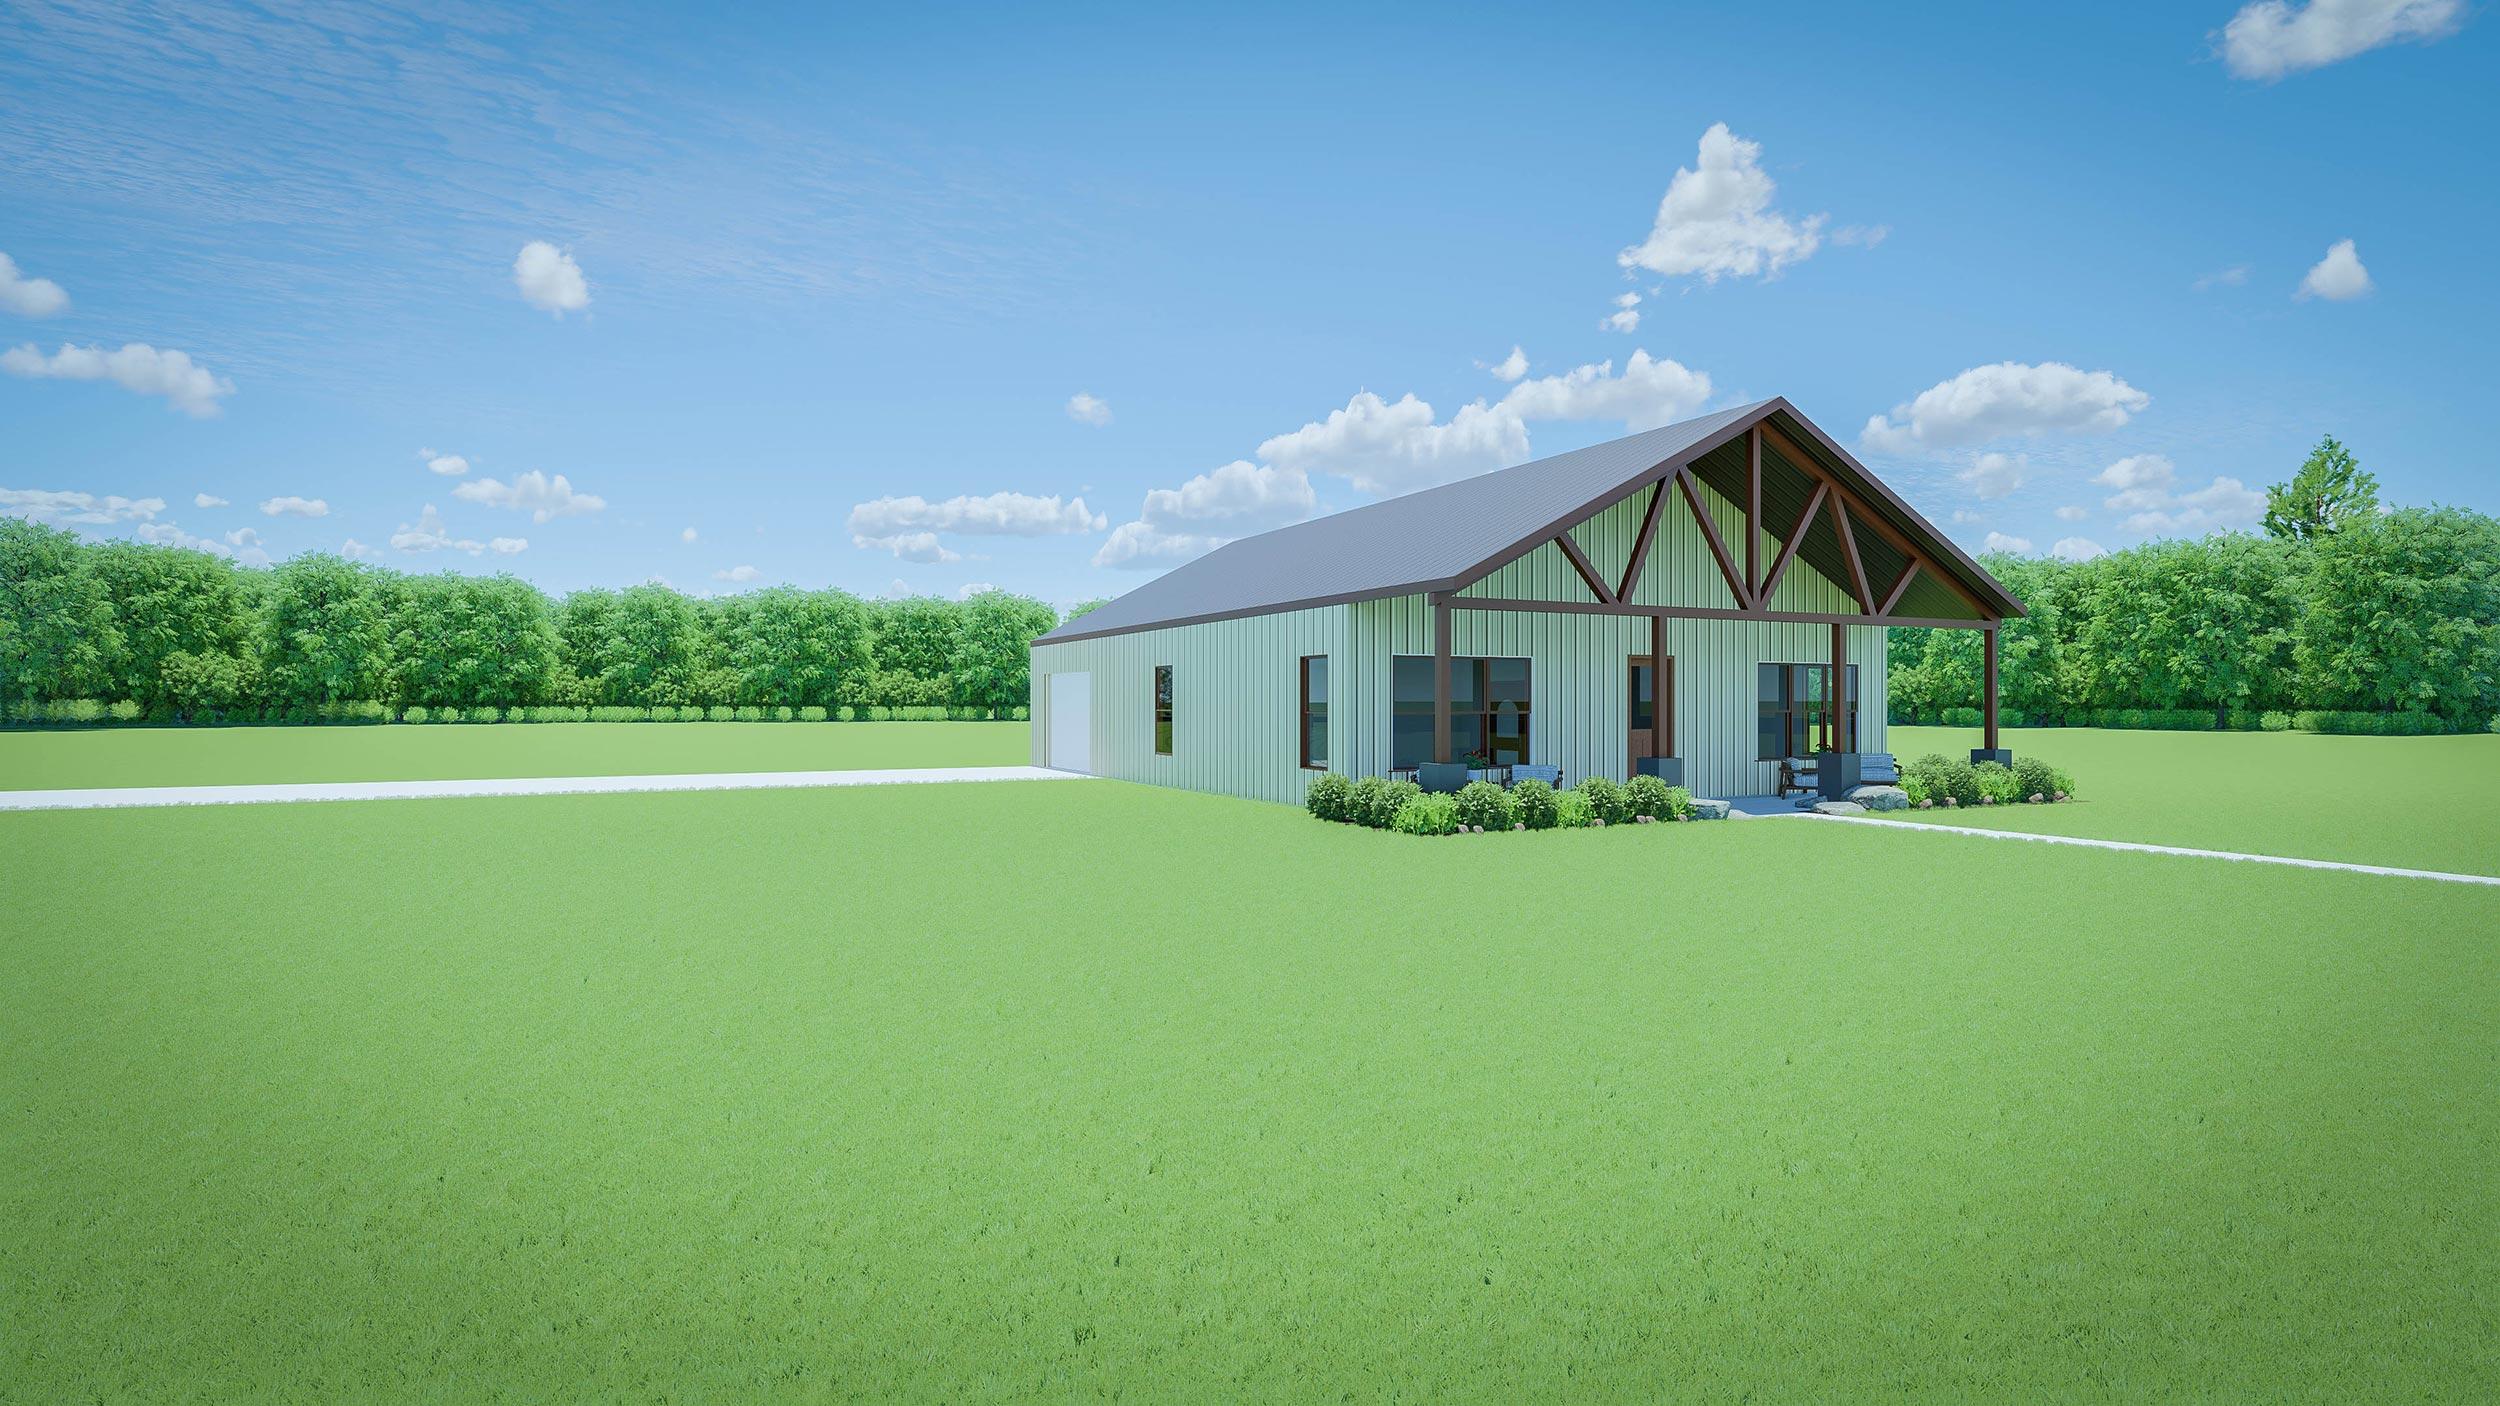 Image of The Lonestar Floor Plan